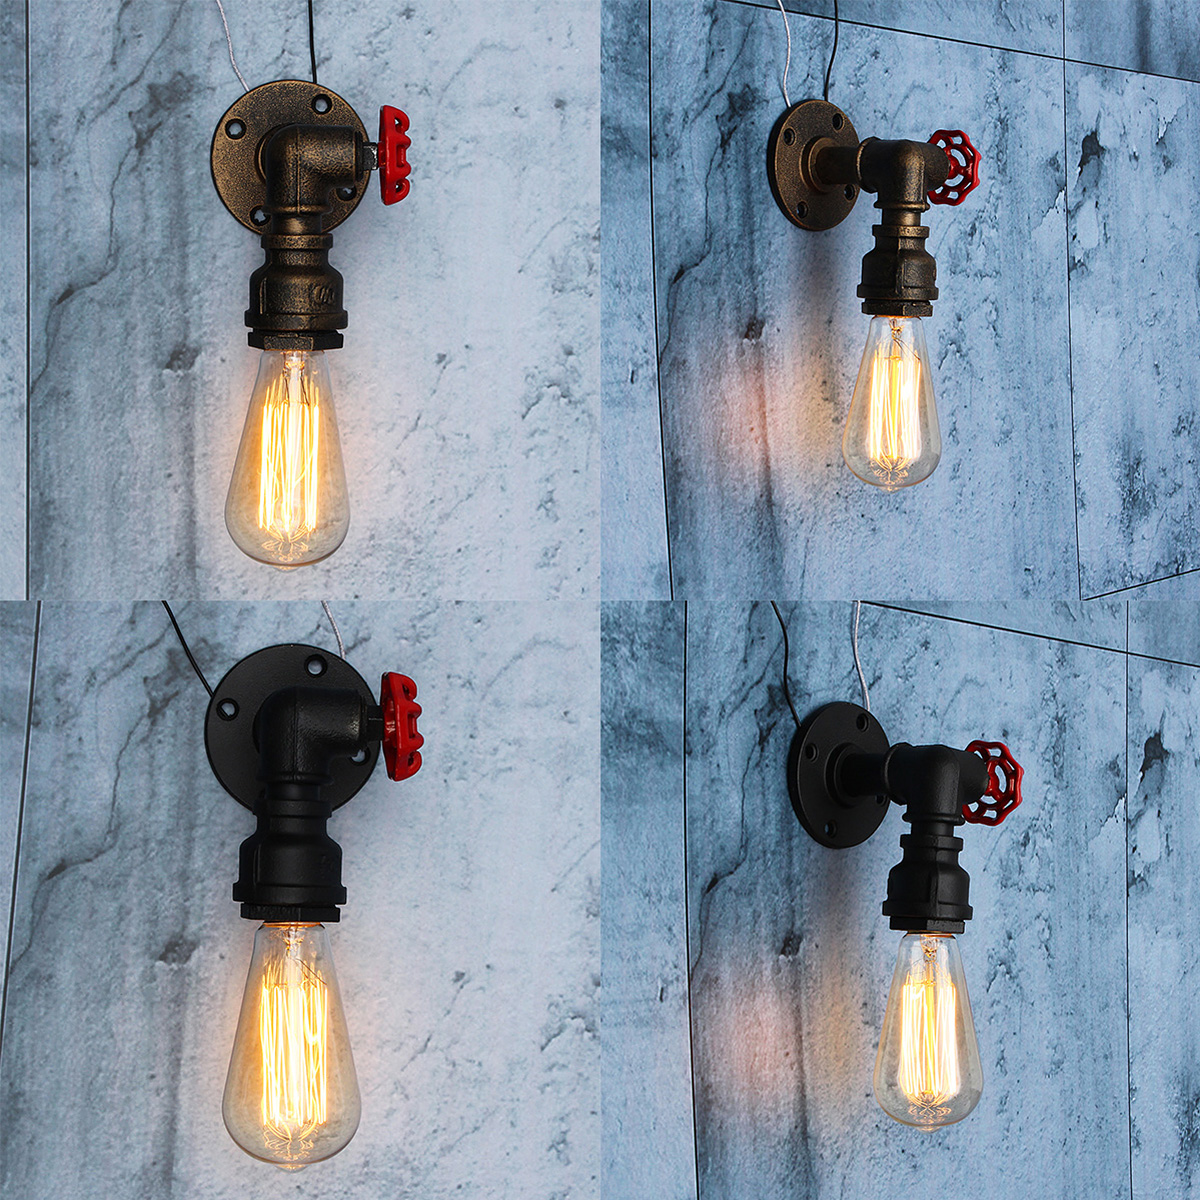 New E27 Vintage Water Pipe Wall Lamp Faucet Shape Steam Punk Loft Industrial Iron Rust Retro Home Bar Decor Lighting Fixtures